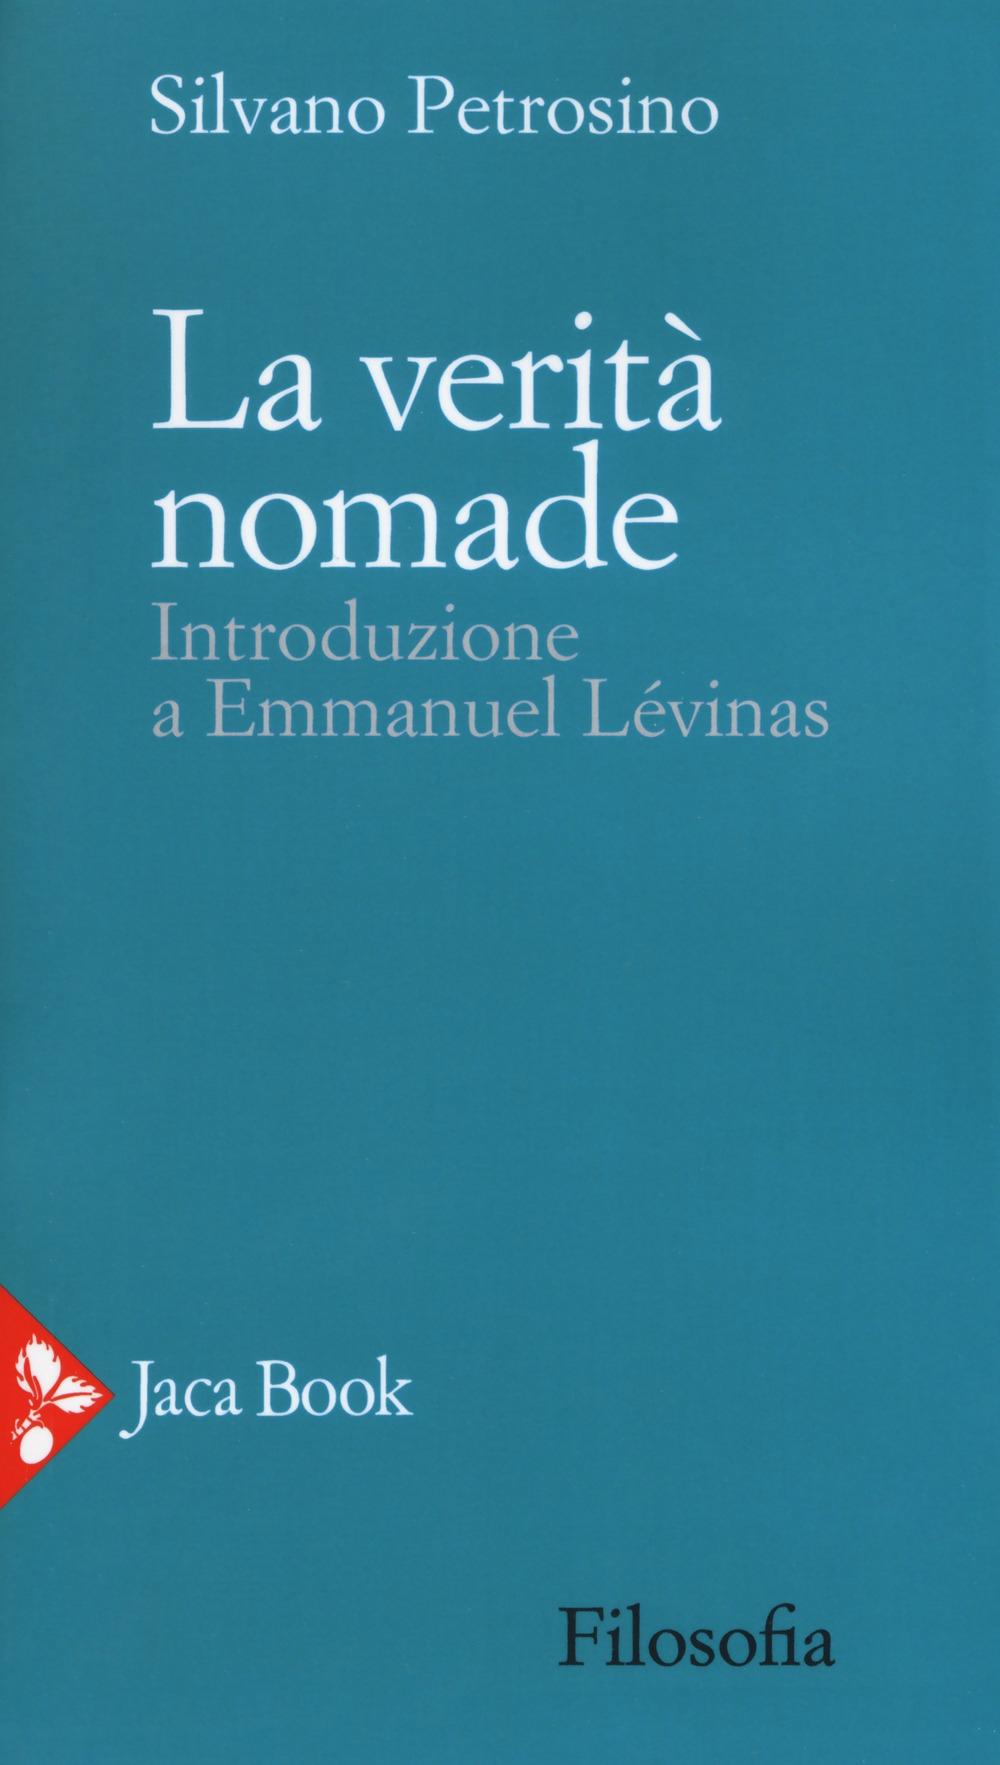 La verità nomade. Introduzione a Emmanuel Levinas